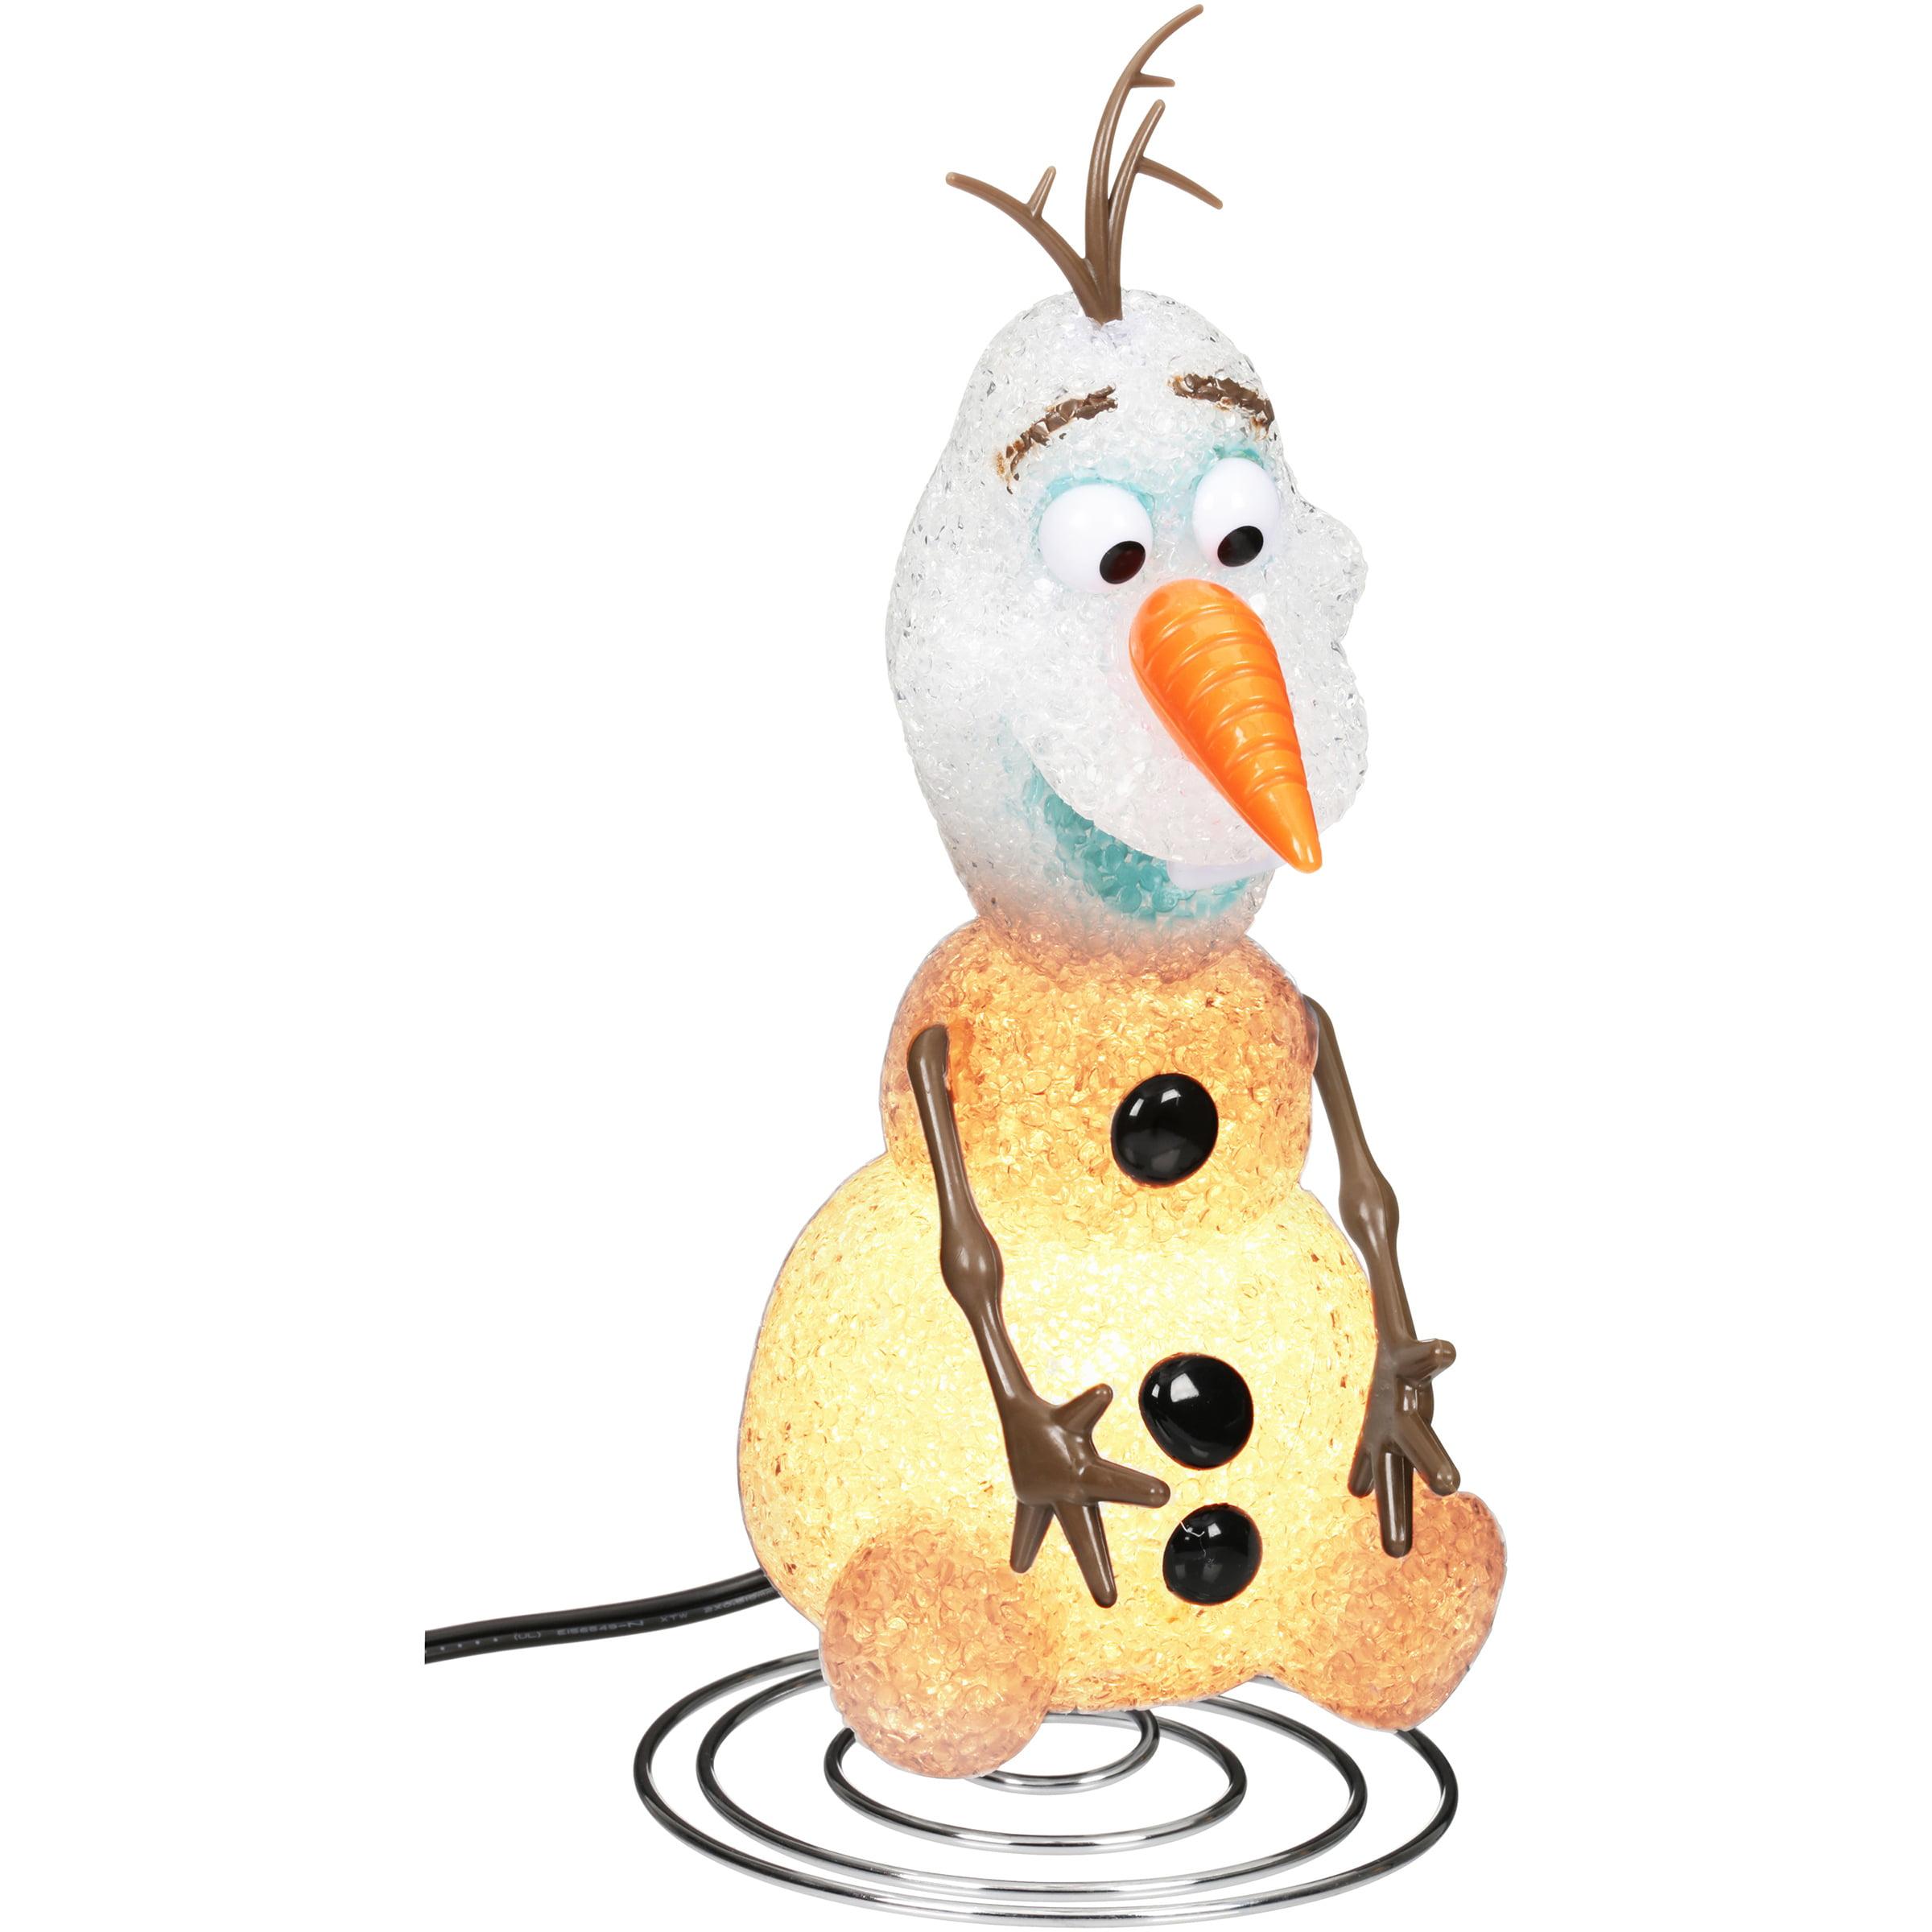 3b2db0f7aefd5 Disney Frozen Olaf EVA Lamp